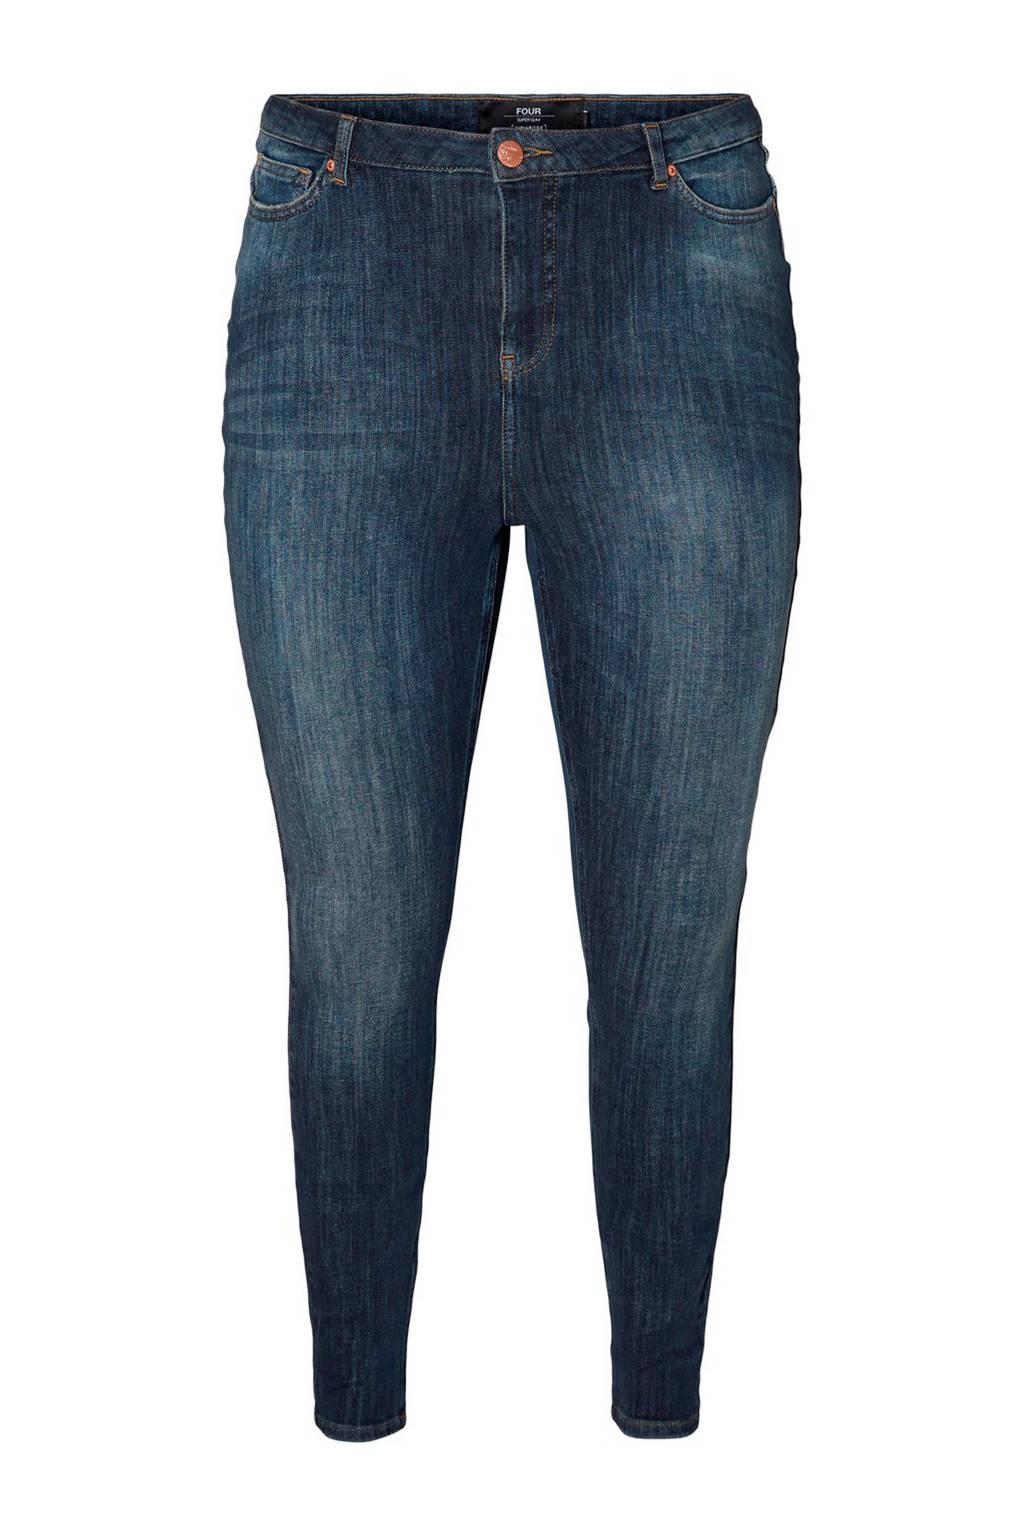 JUNAROSE high waist skinny jeans, Donkerblauw